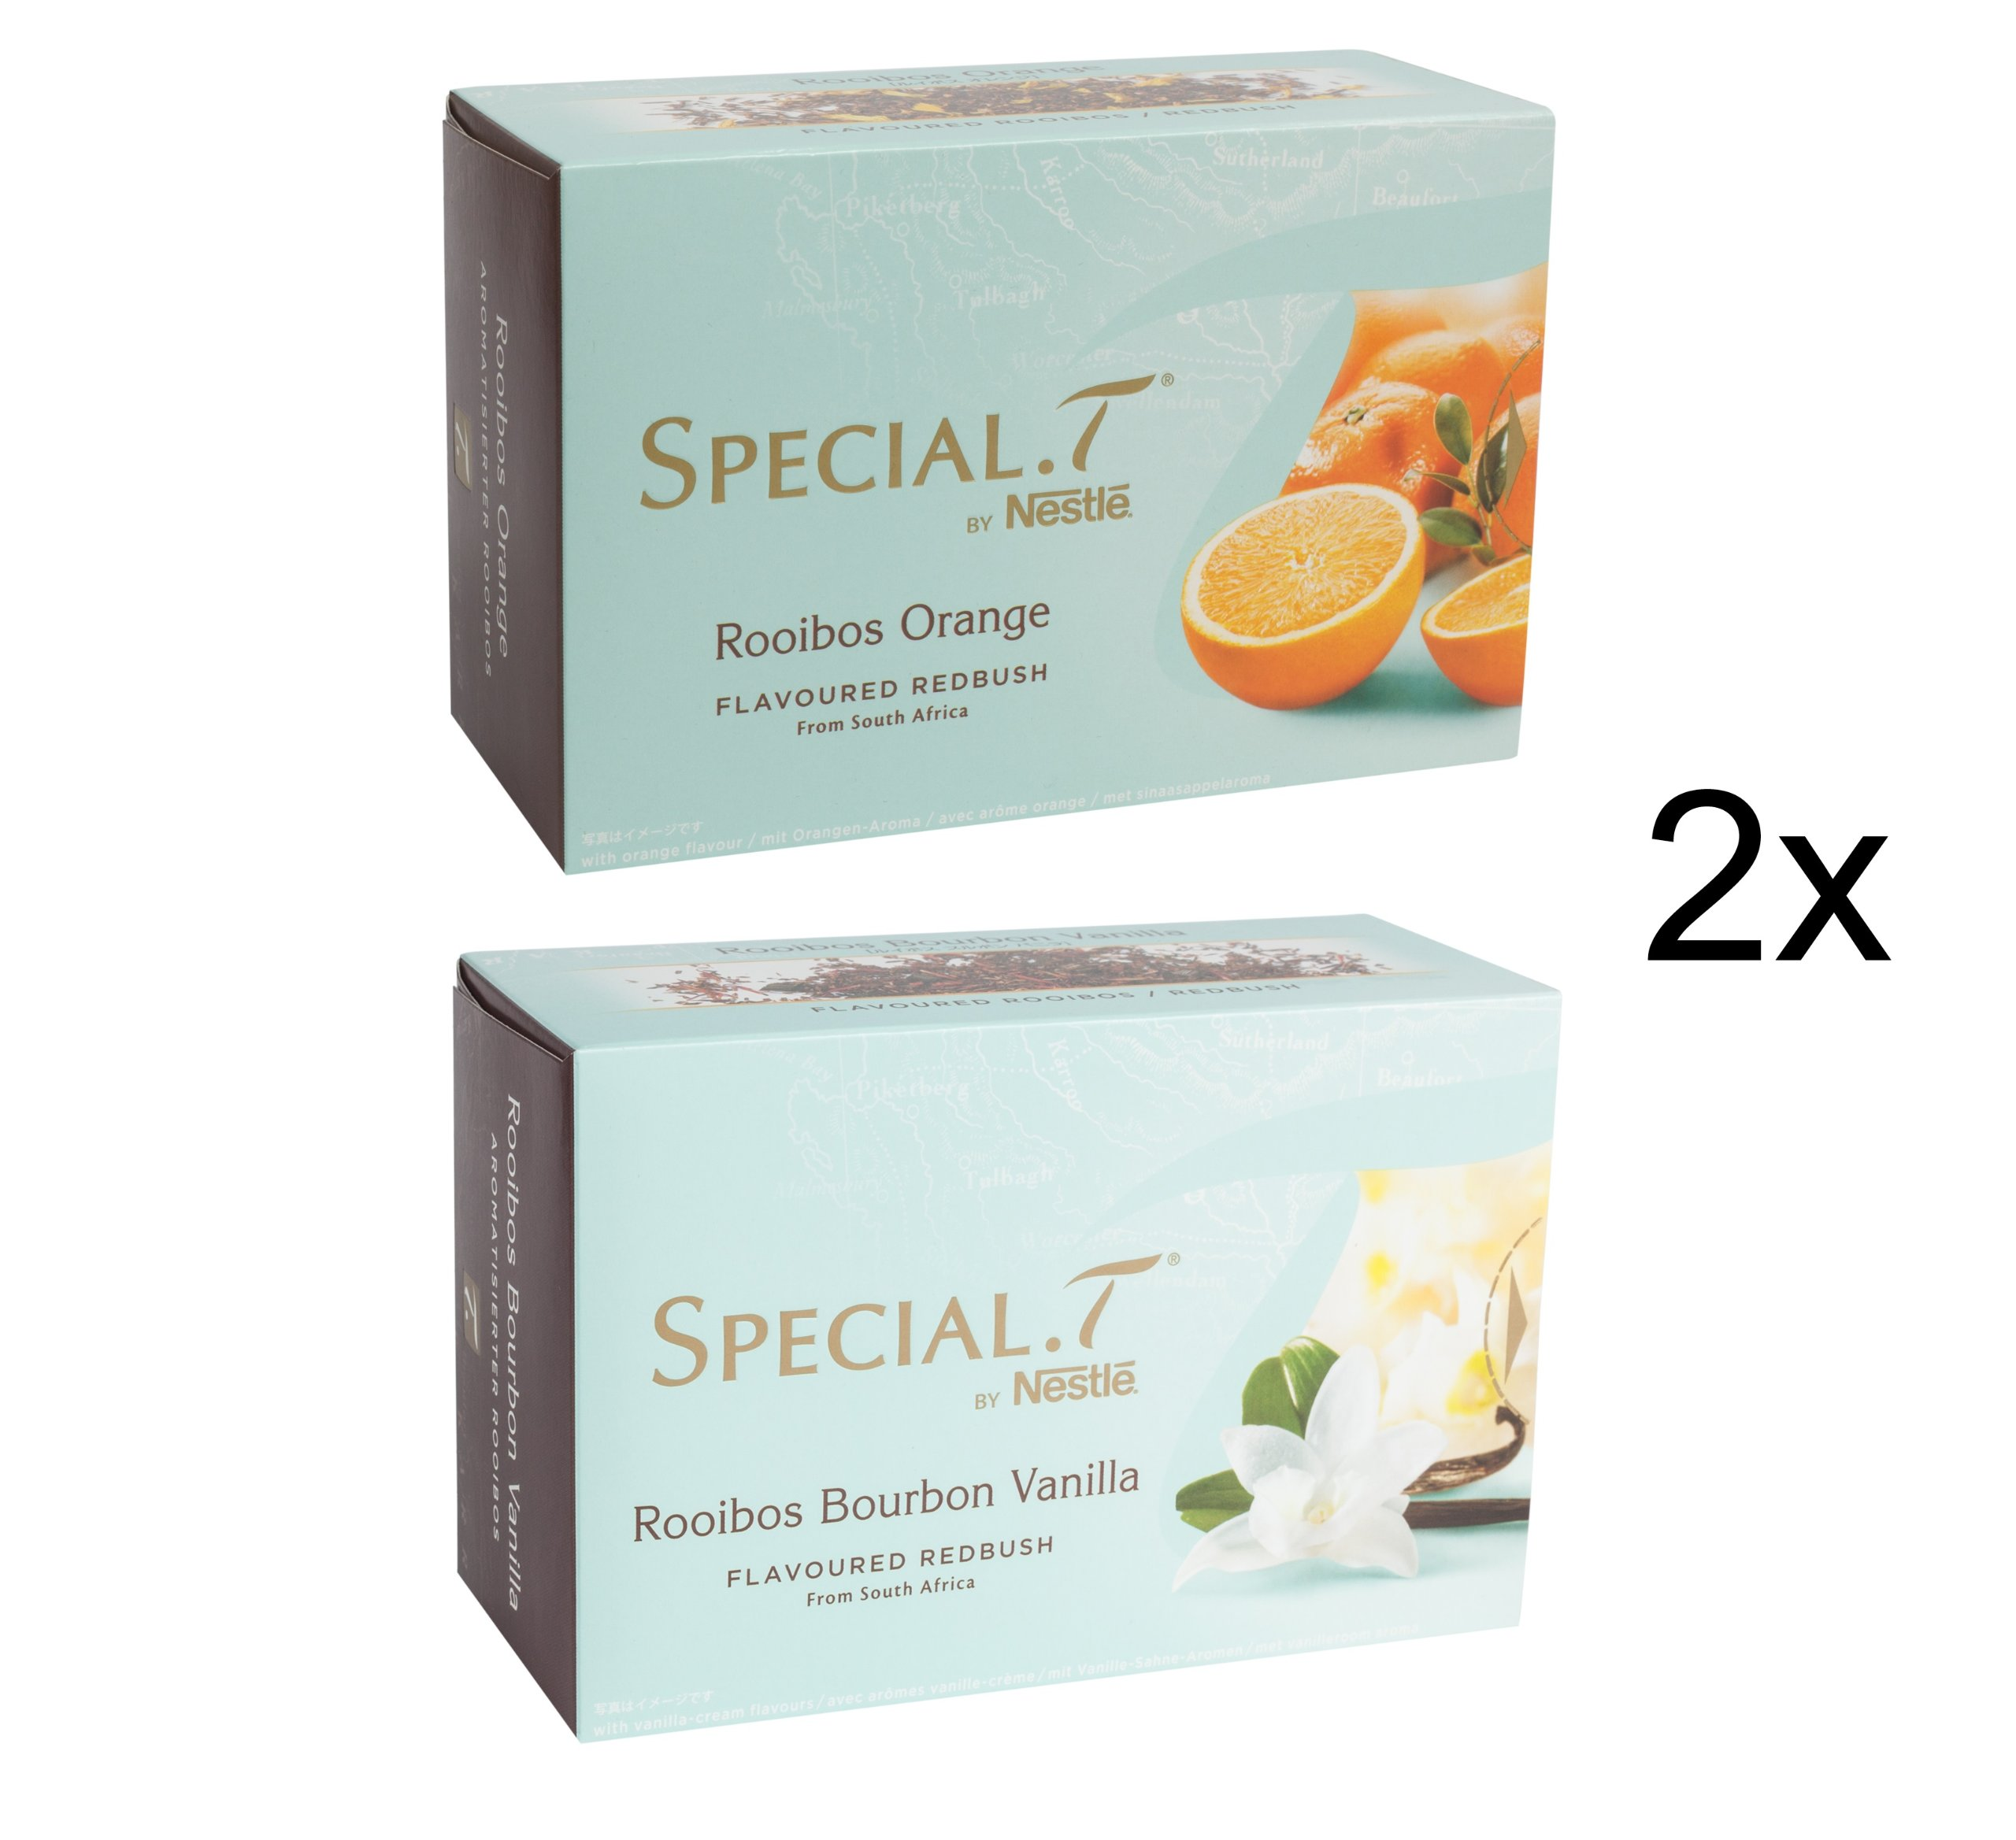 Original-Special-T-Rooibos-Collection-40-Kapseln-2-Sorten-fr-Nestl-Tee-Maschinen-hier-bestellen-Sortiment-Mix-Rooibos-Bourbon-Vanilla-und-Rooibos-Orange